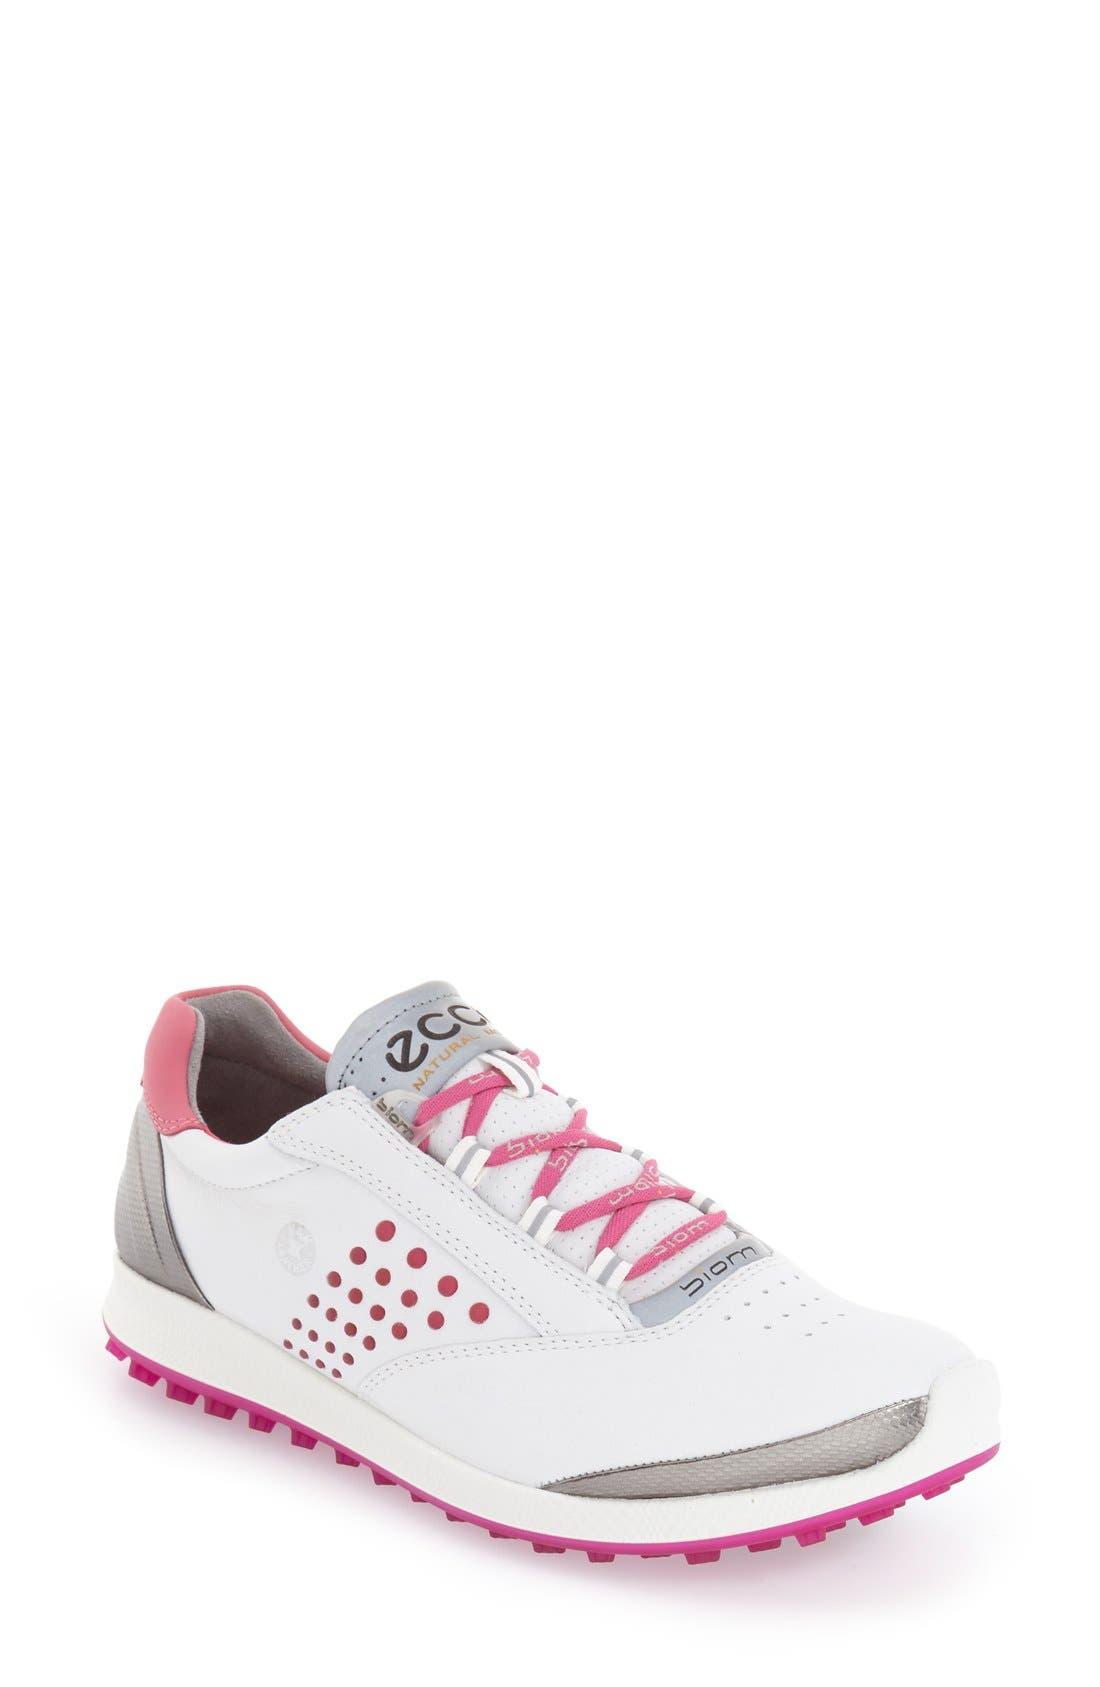 'BIOM' Hydromax<sup>®</sup> Waterproof Golf Shoe,                             Main thumbnail 5, color,